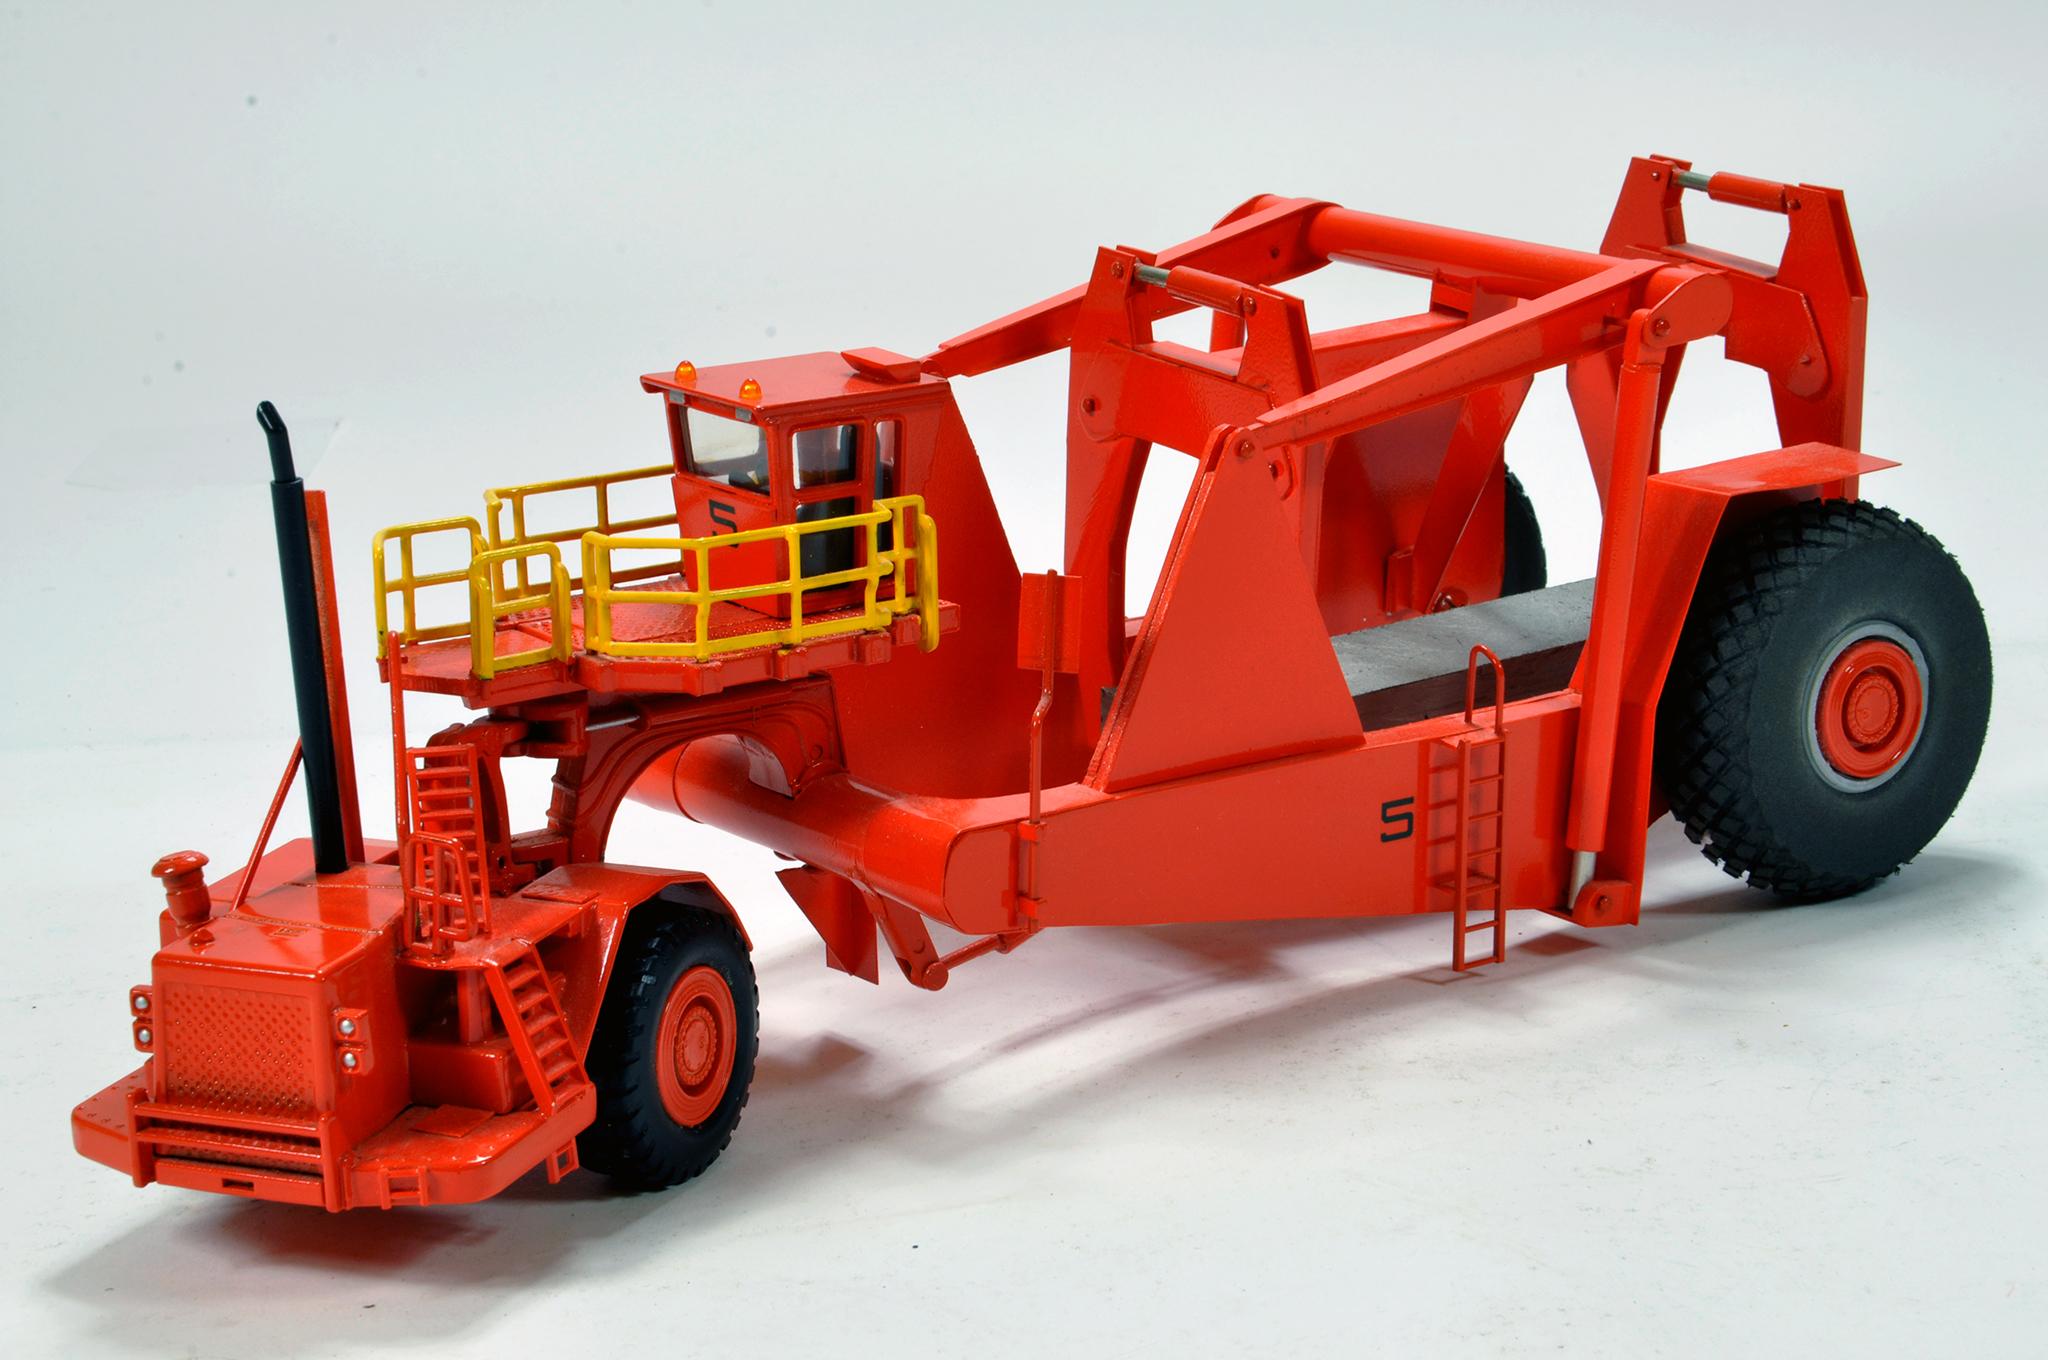 Lot 381 - Steelman (USA) 1/50 construction issue comprising Scratchbuilt Model of a Kress Type Slab Carrier as